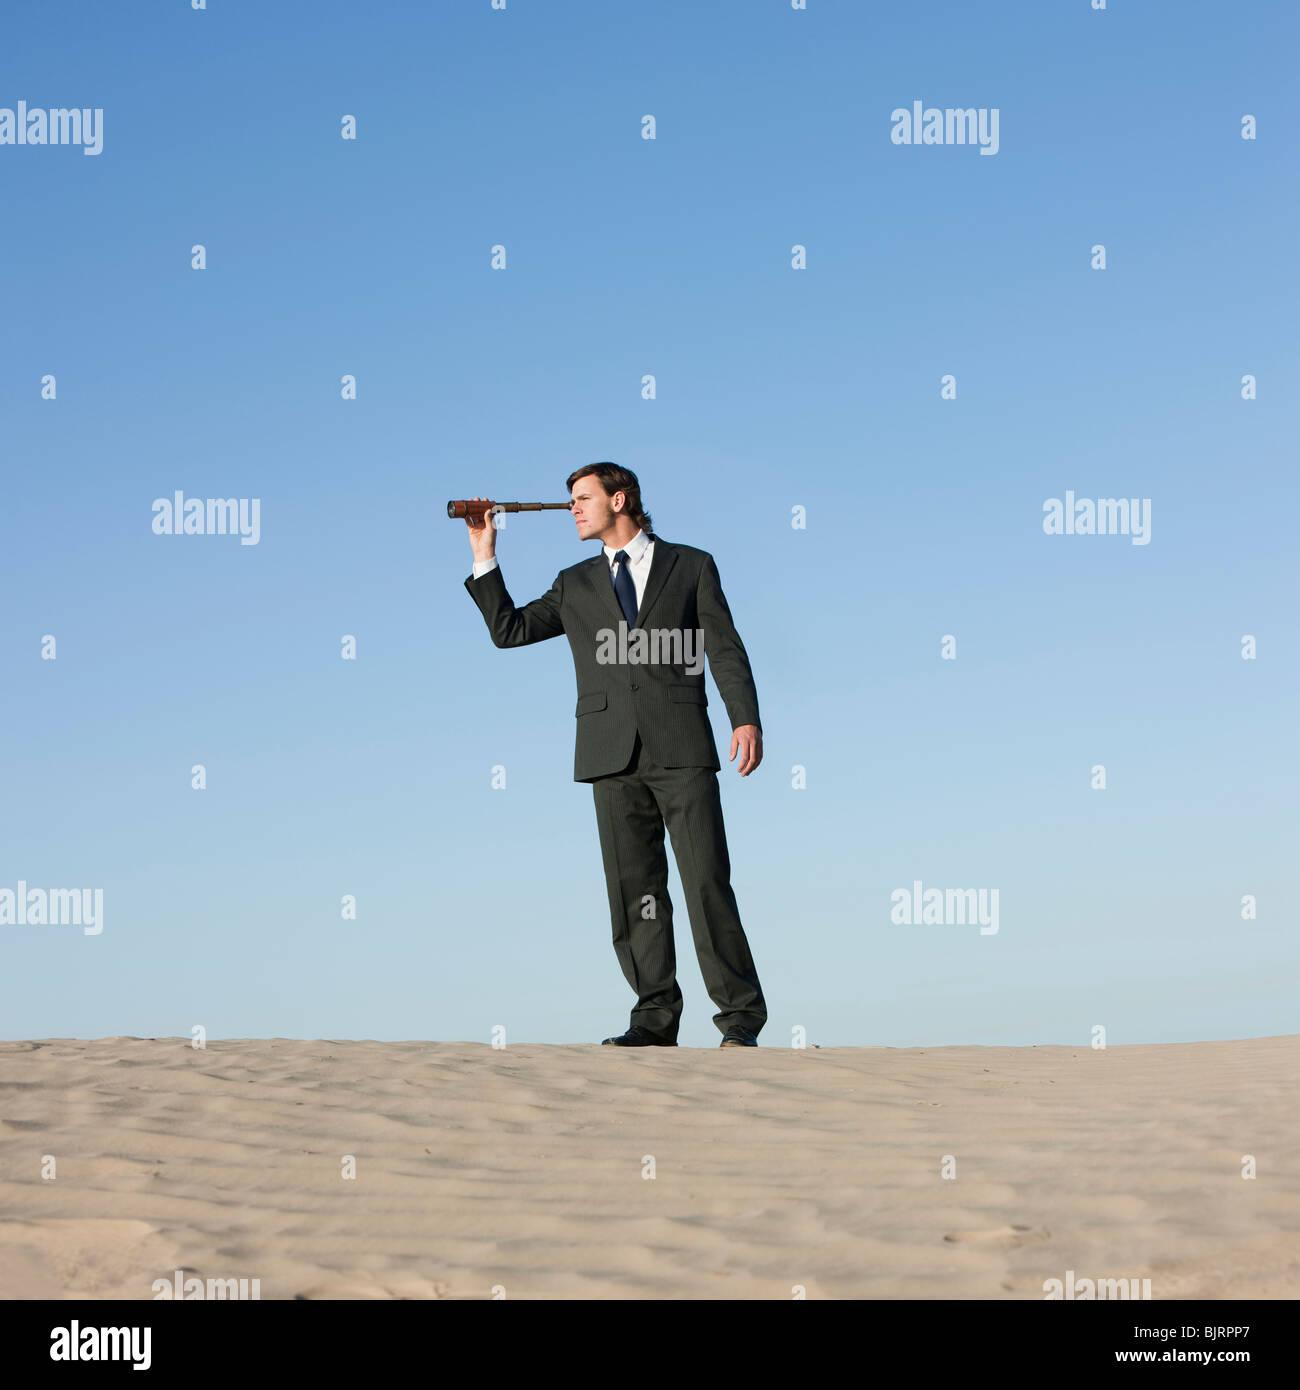 USA, Utah, Little Sahara, businessman looking through telescope in desert - Stock Image